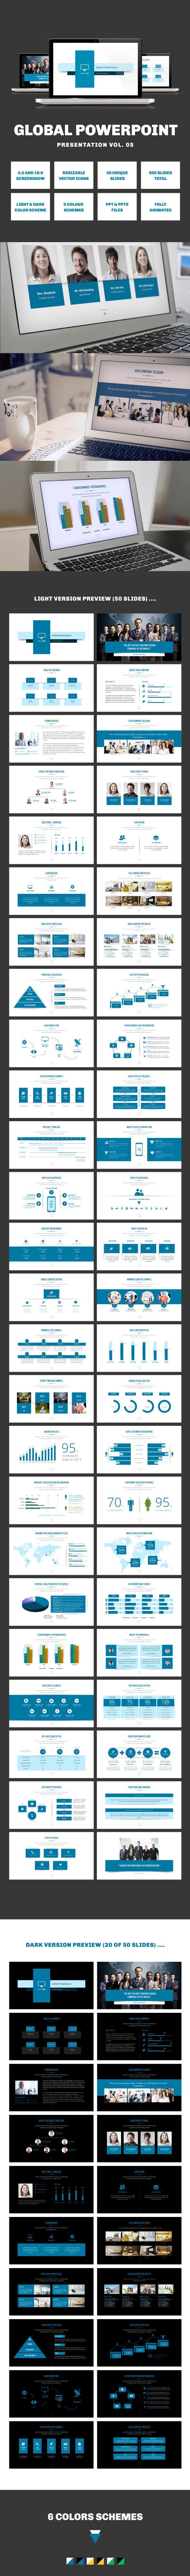 Multipurpose PowerPoint Presentation (Vol. 05) - PowerPoint Templates Presentation Templates